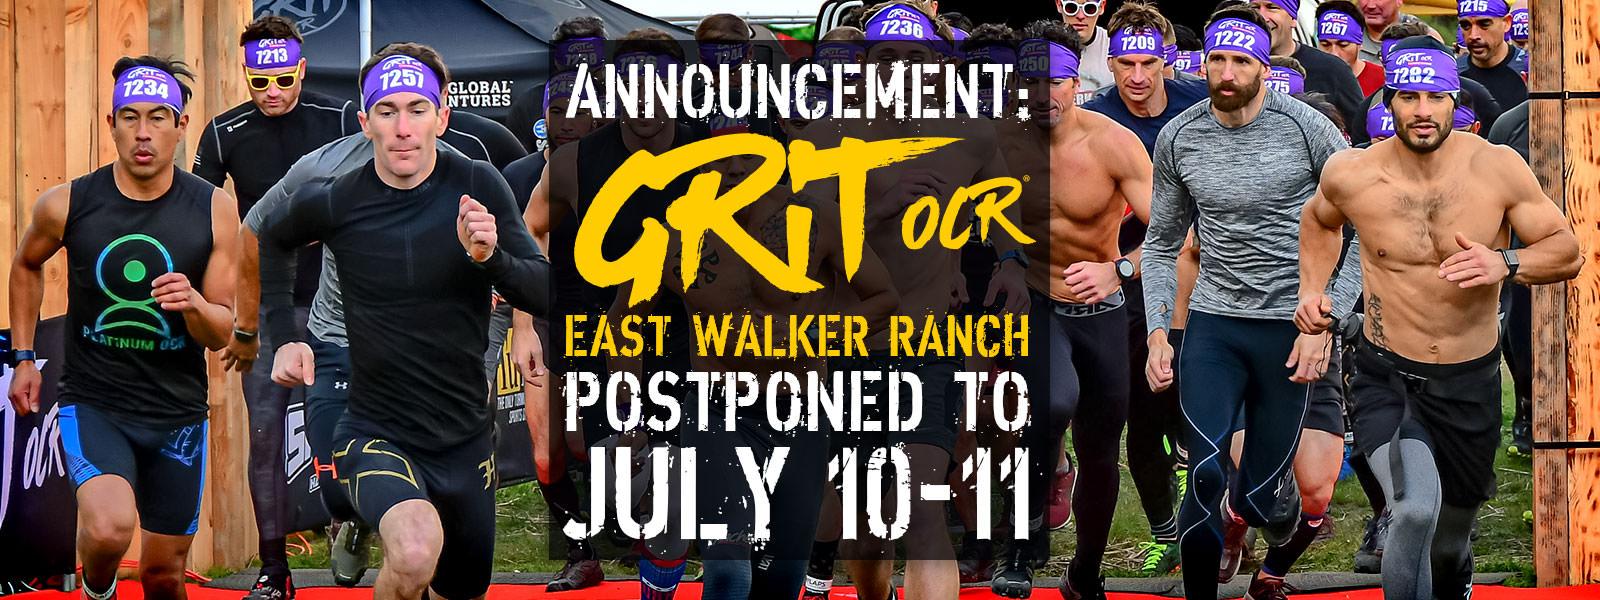 East Walker Ranch Postponed To July